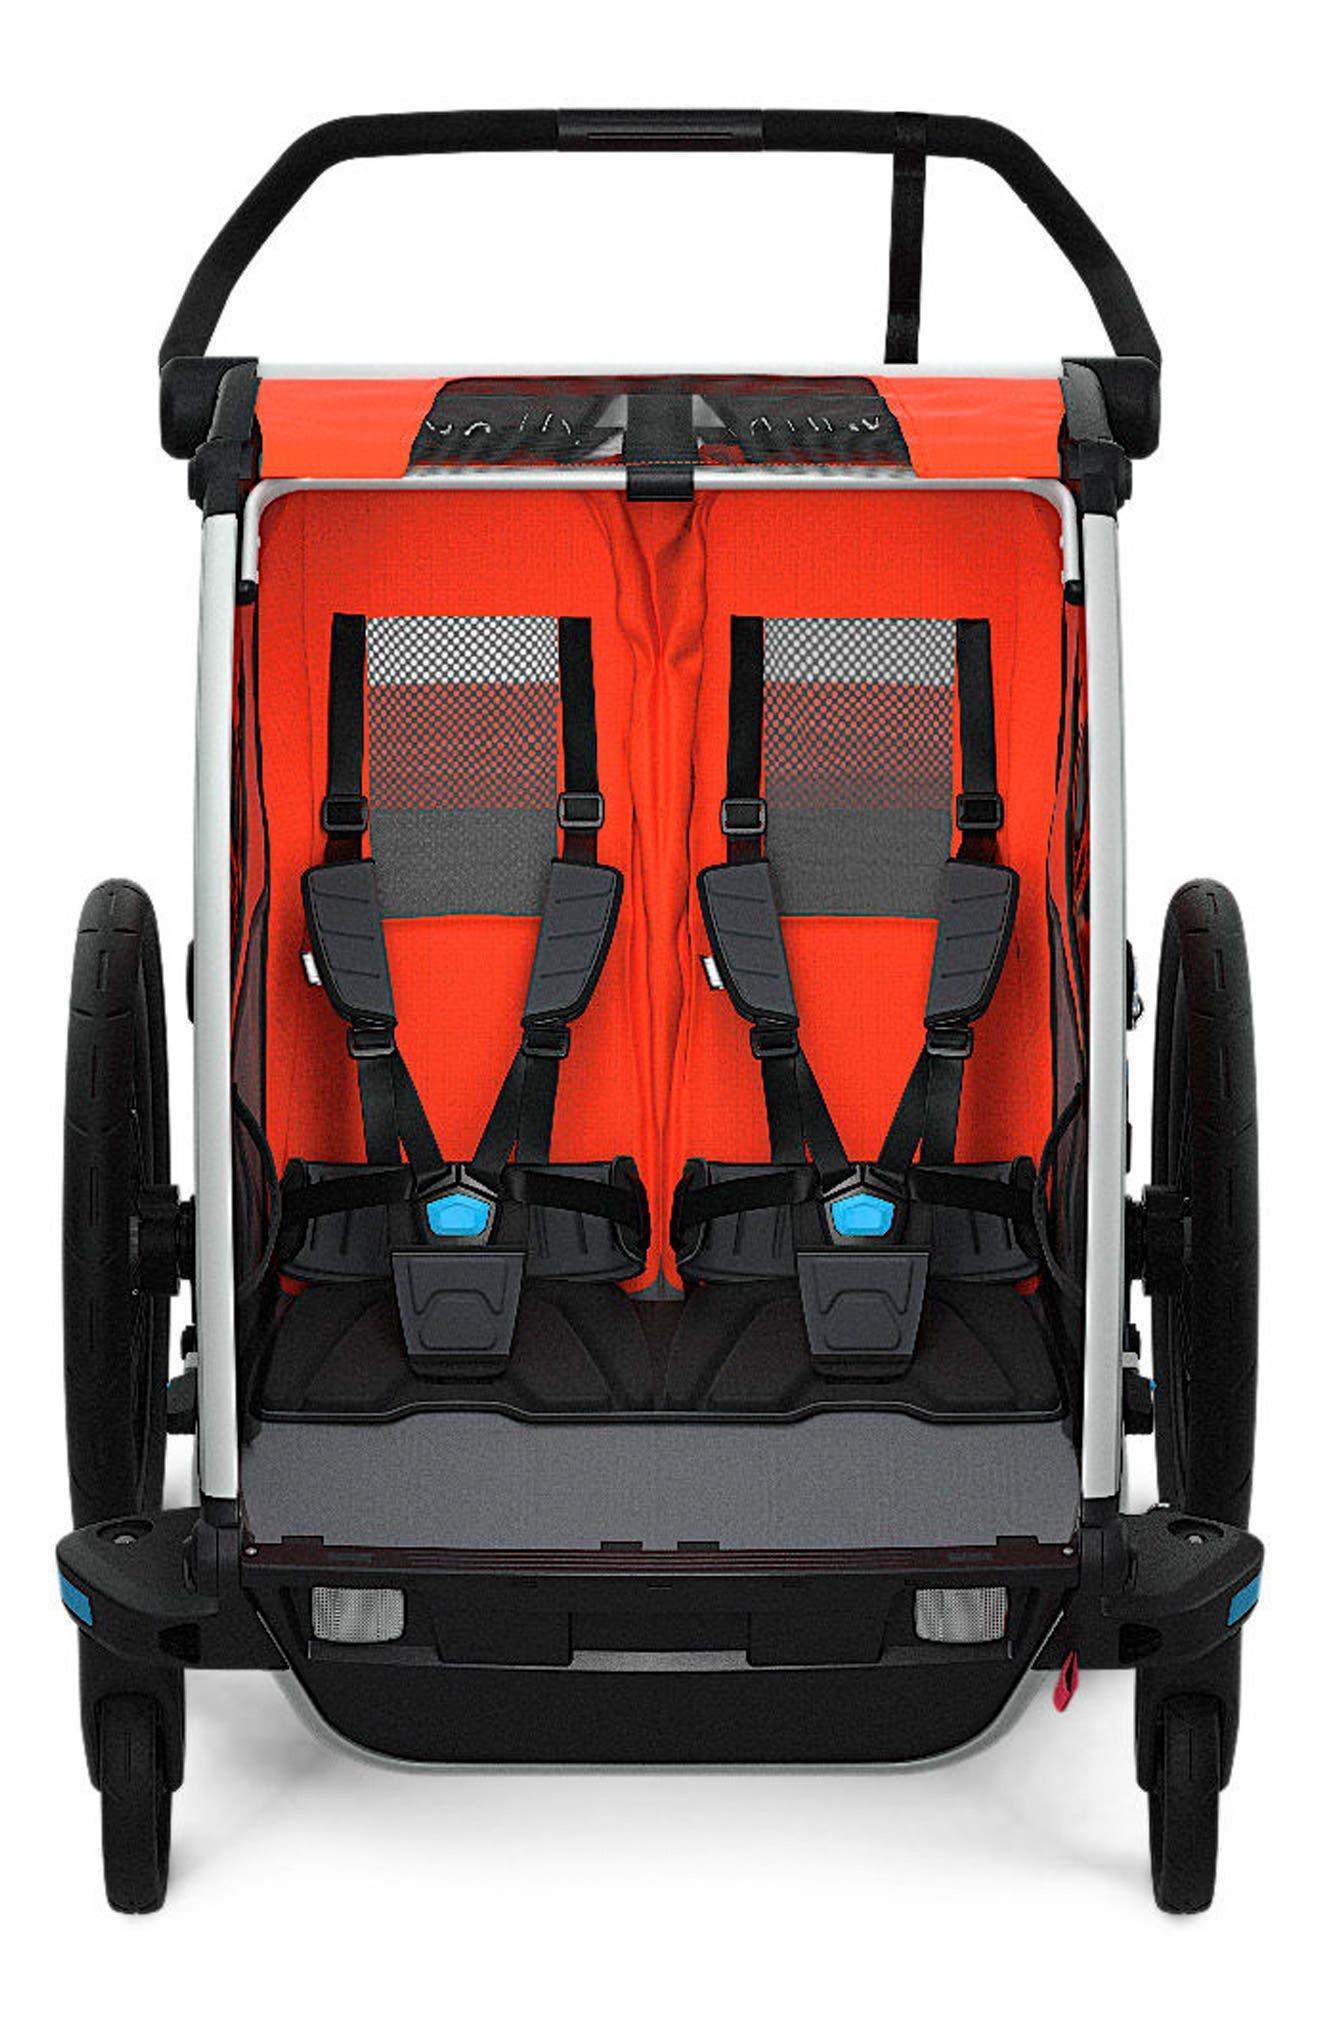 Chariot Cross 2 Multisport Double Cycle Trailer/Stroller,                         Main,                         color, ROARANGE